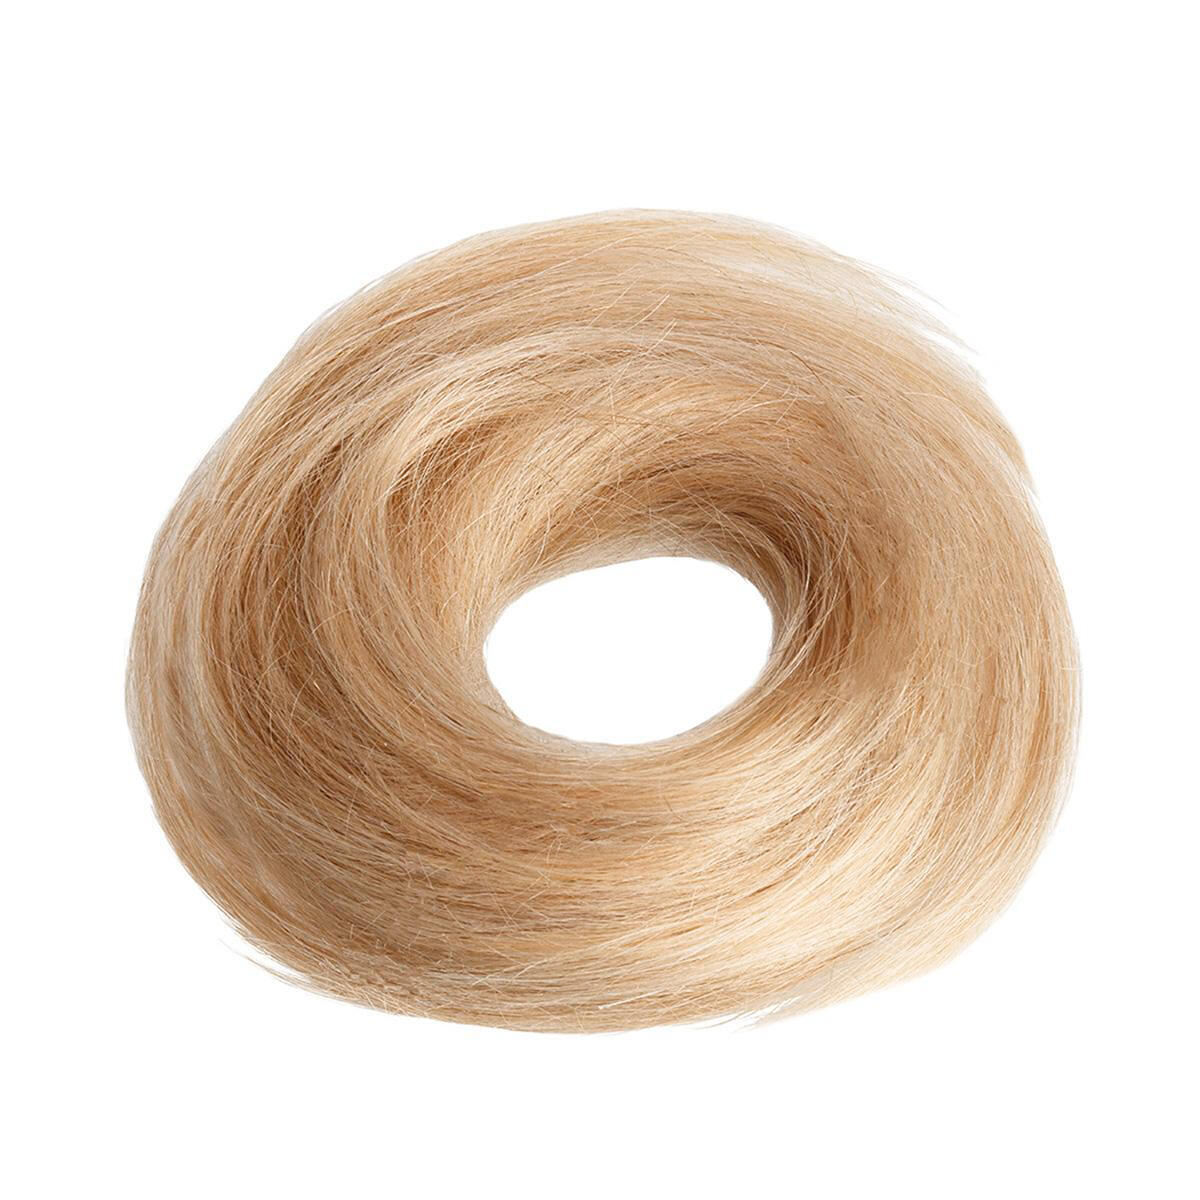 Hair Scrunchie 20 G Scrunchie with real hair M7.4/8.0 Summer Blonde Mix